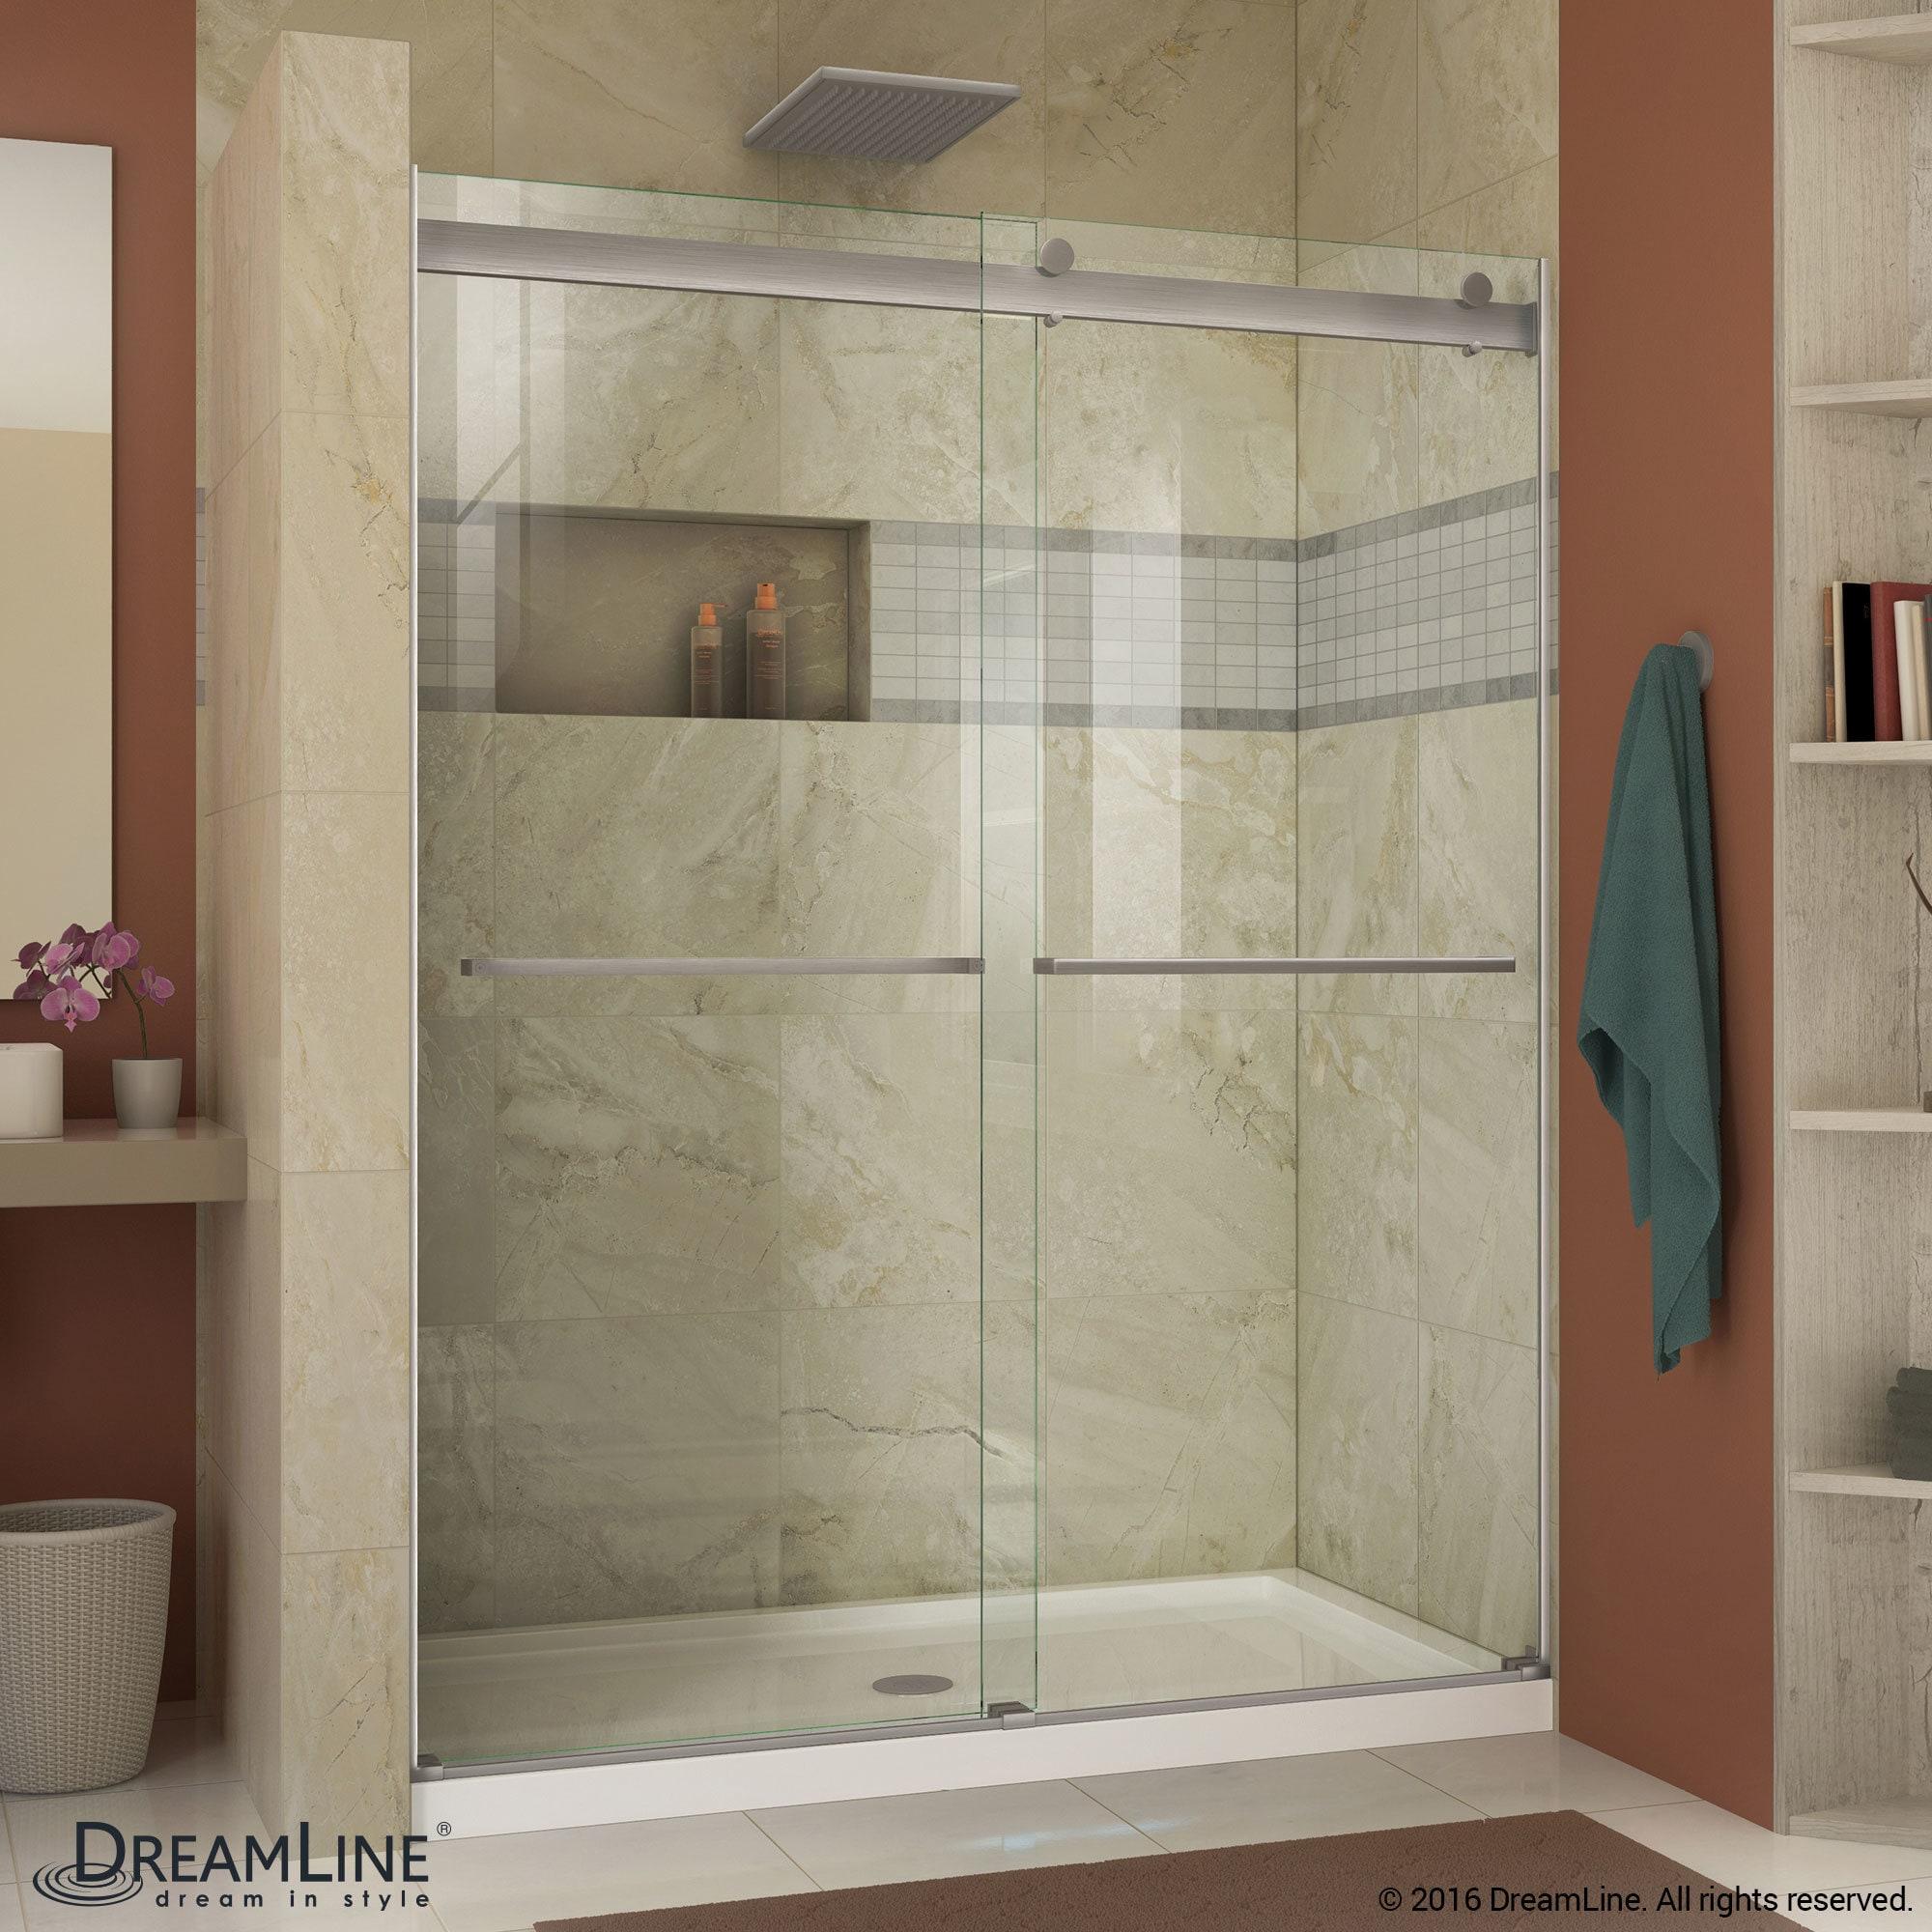 DreamLine Essence 44 to 48 in. Frameless Bypass Shower Door - Free ...